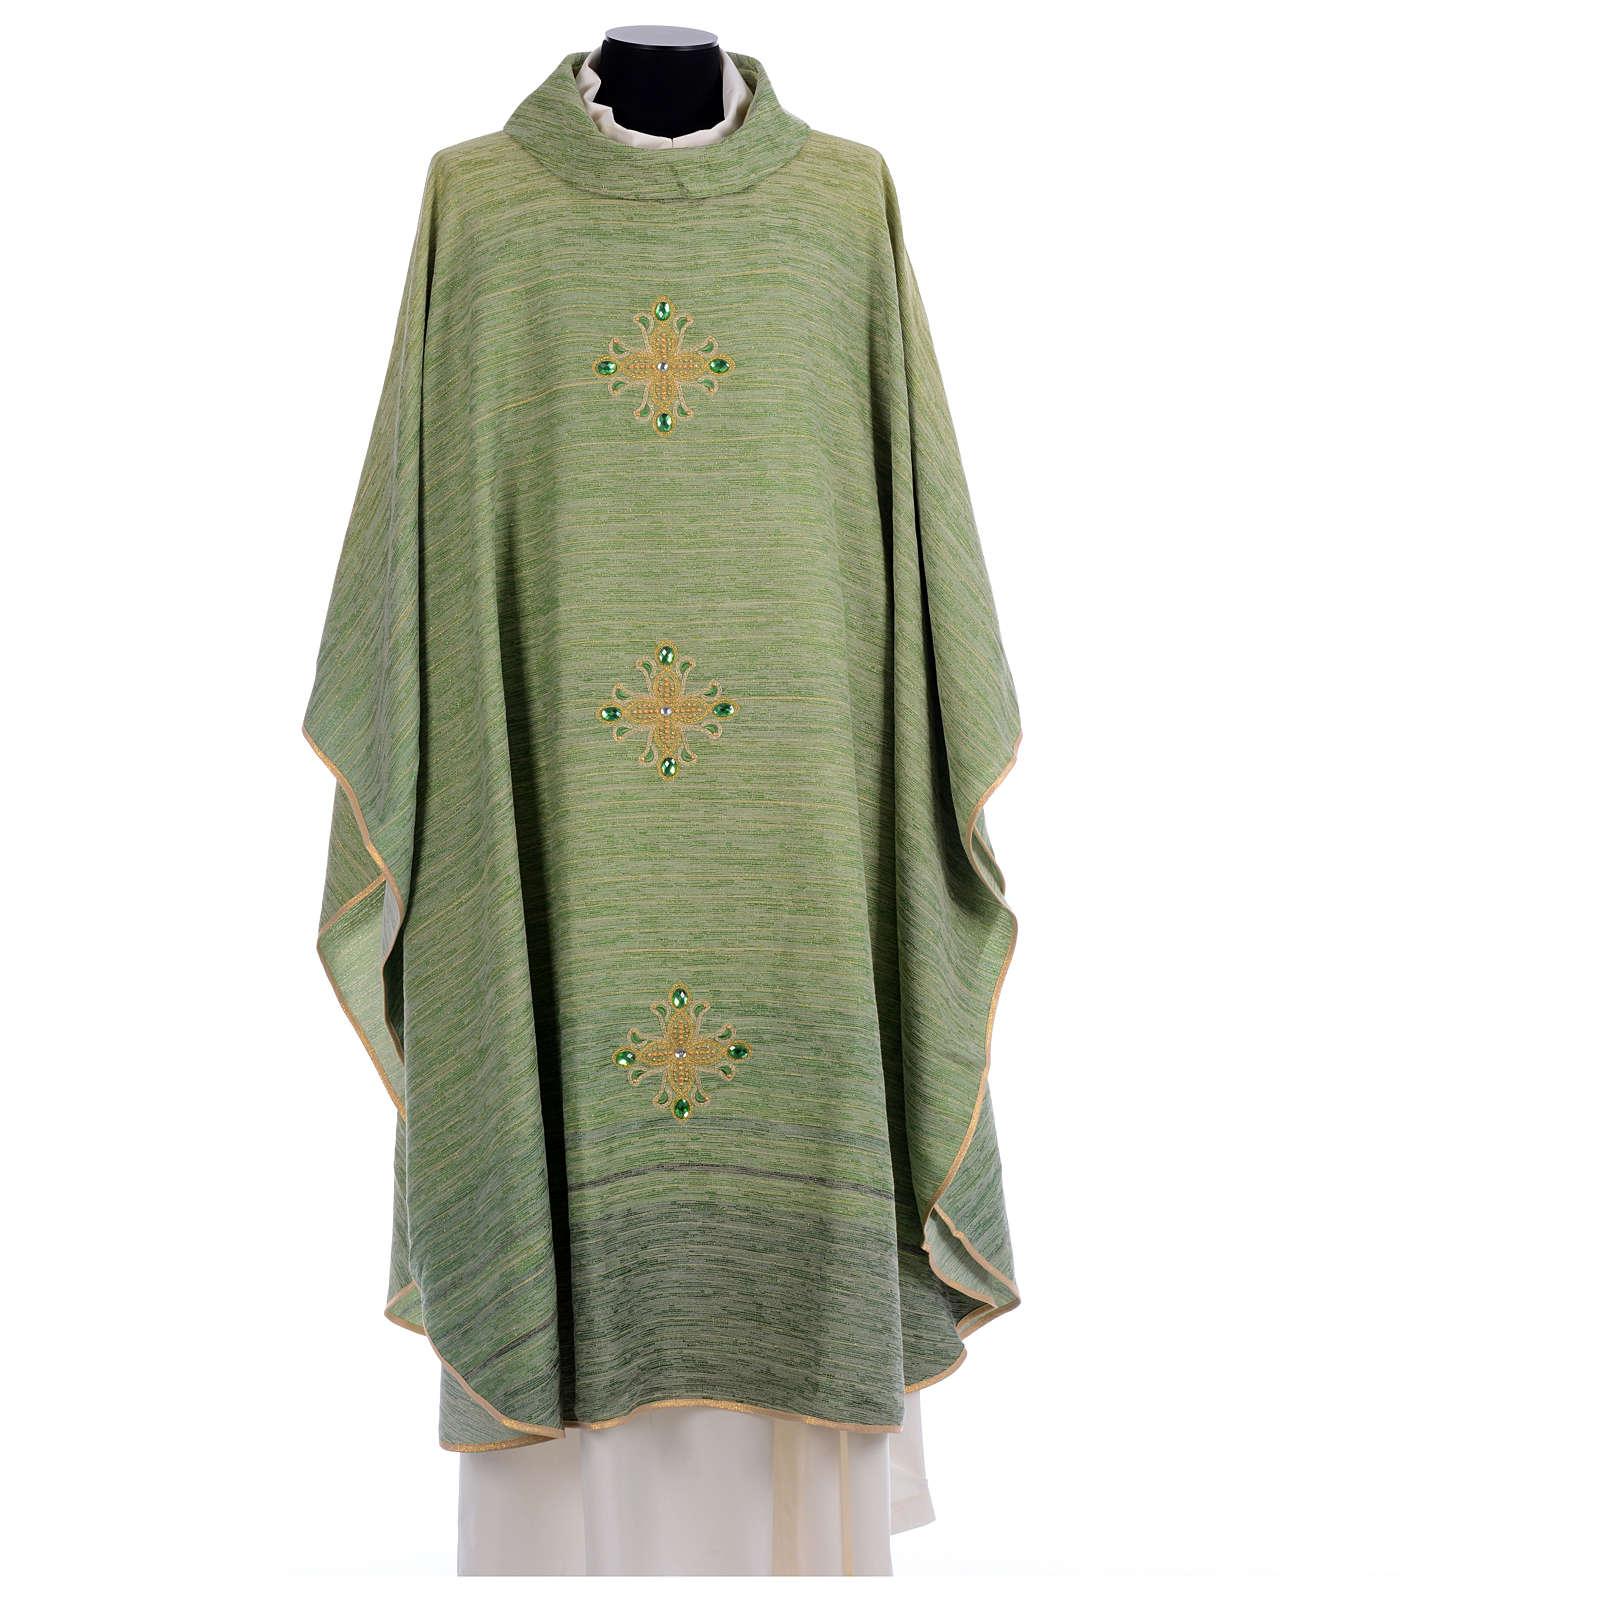 Casulla degradada con cruces en hilos dorados bordados 4